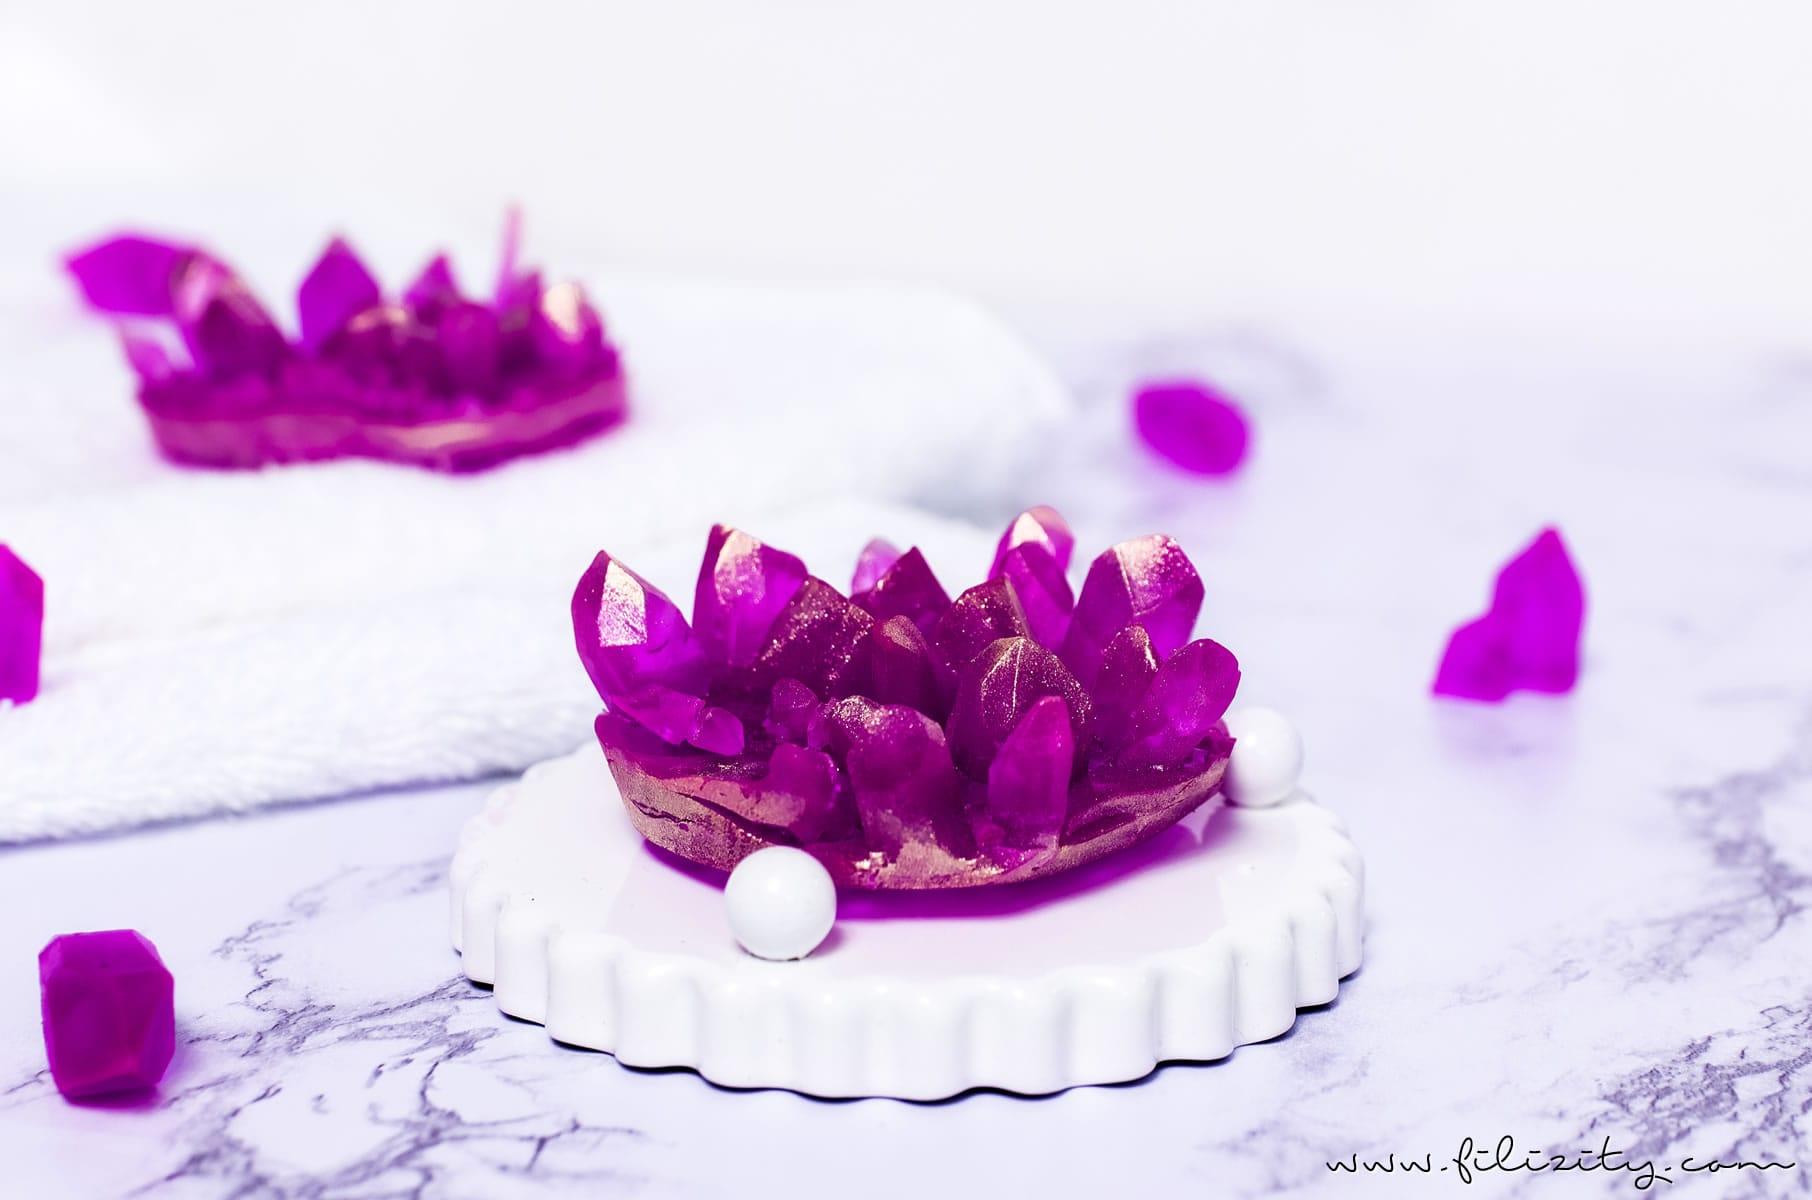 DIY Geschenkidee: Kristall-Seife selber machen